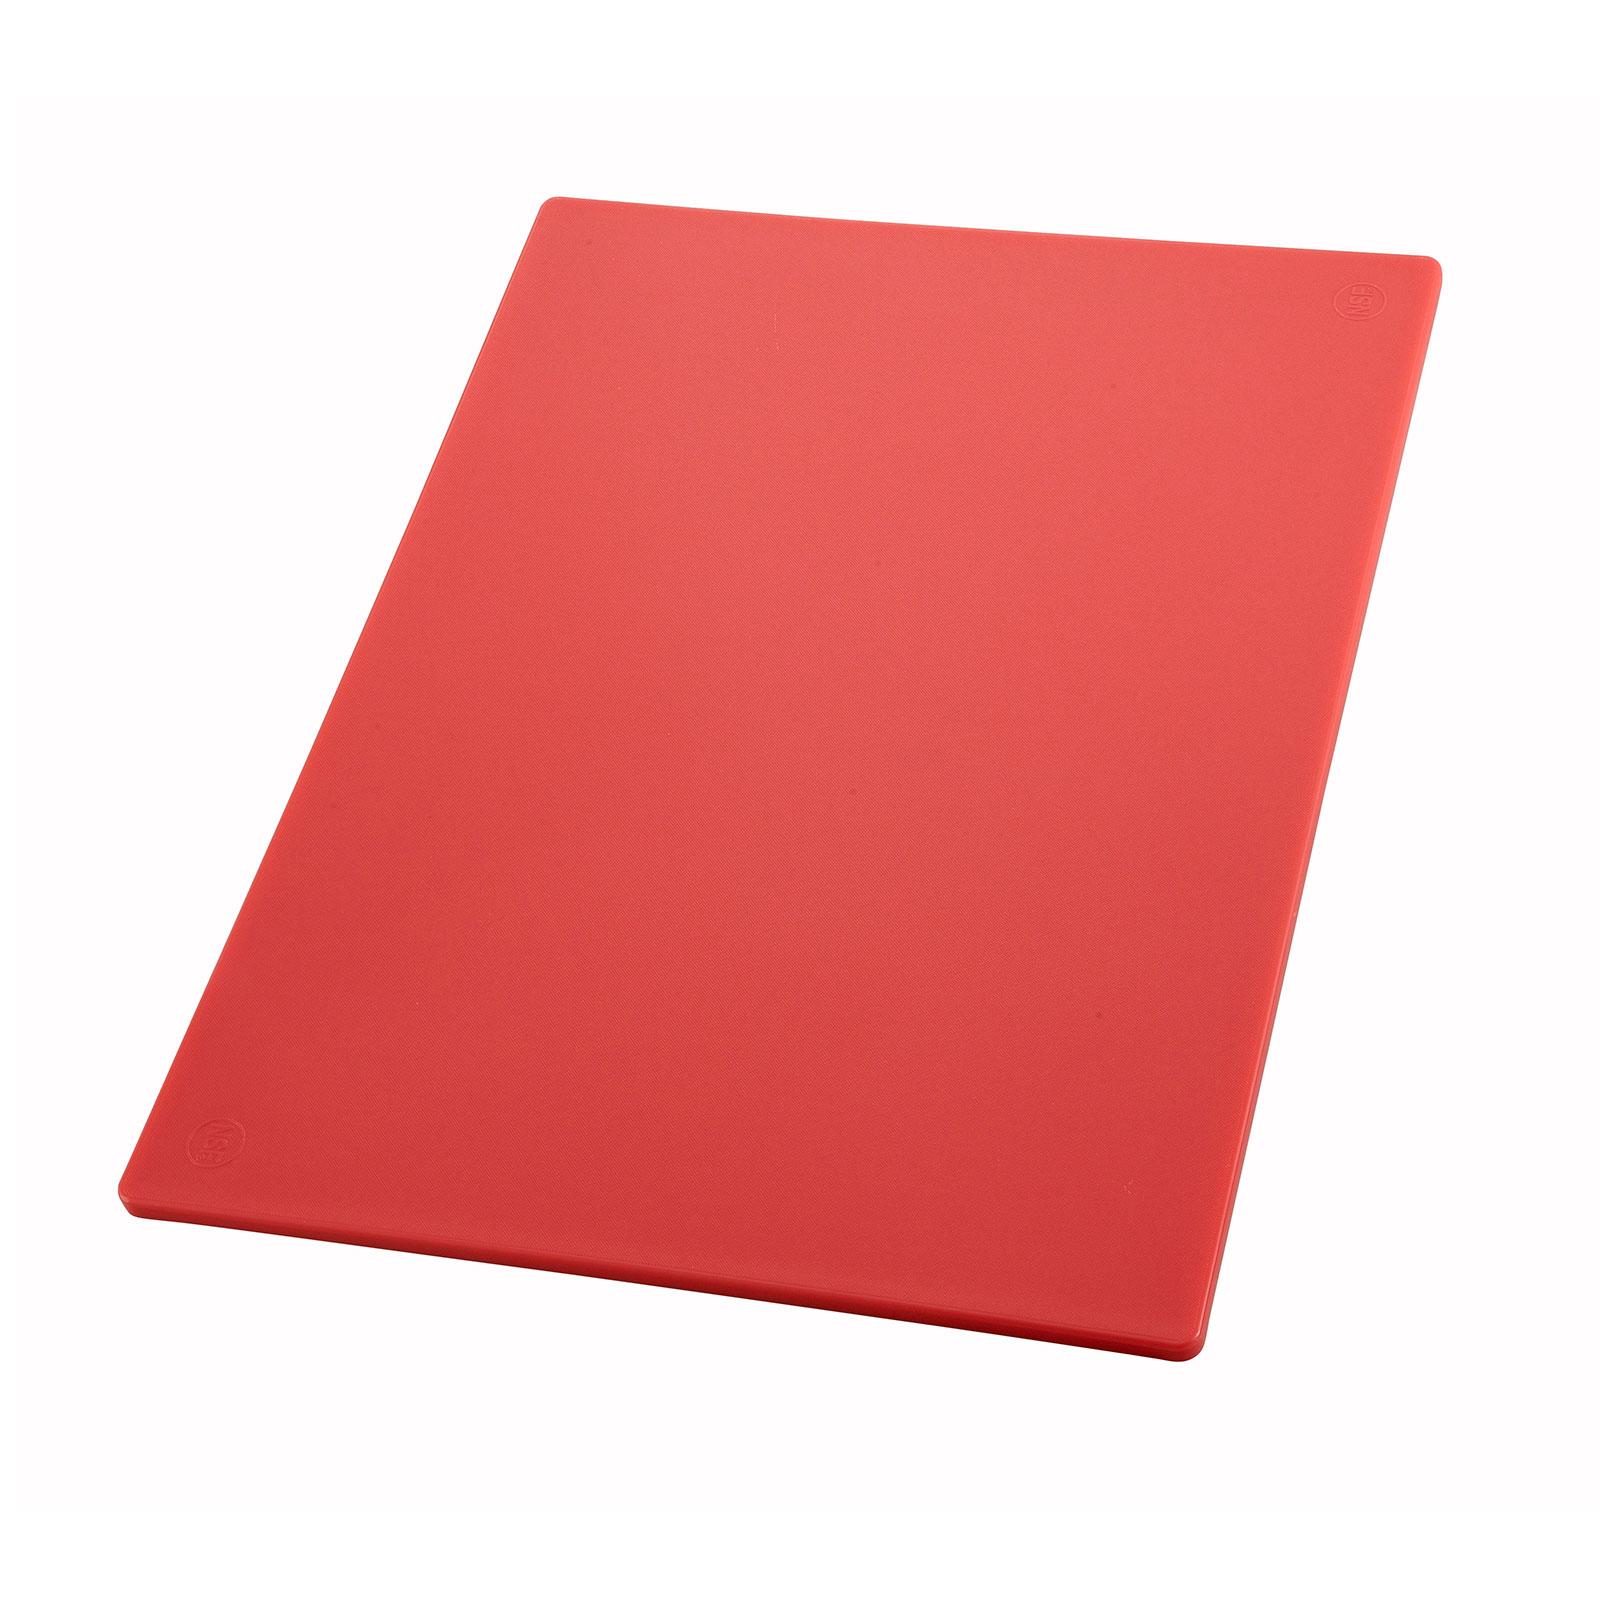 Winco CBRD-1218 cutting board, plastic